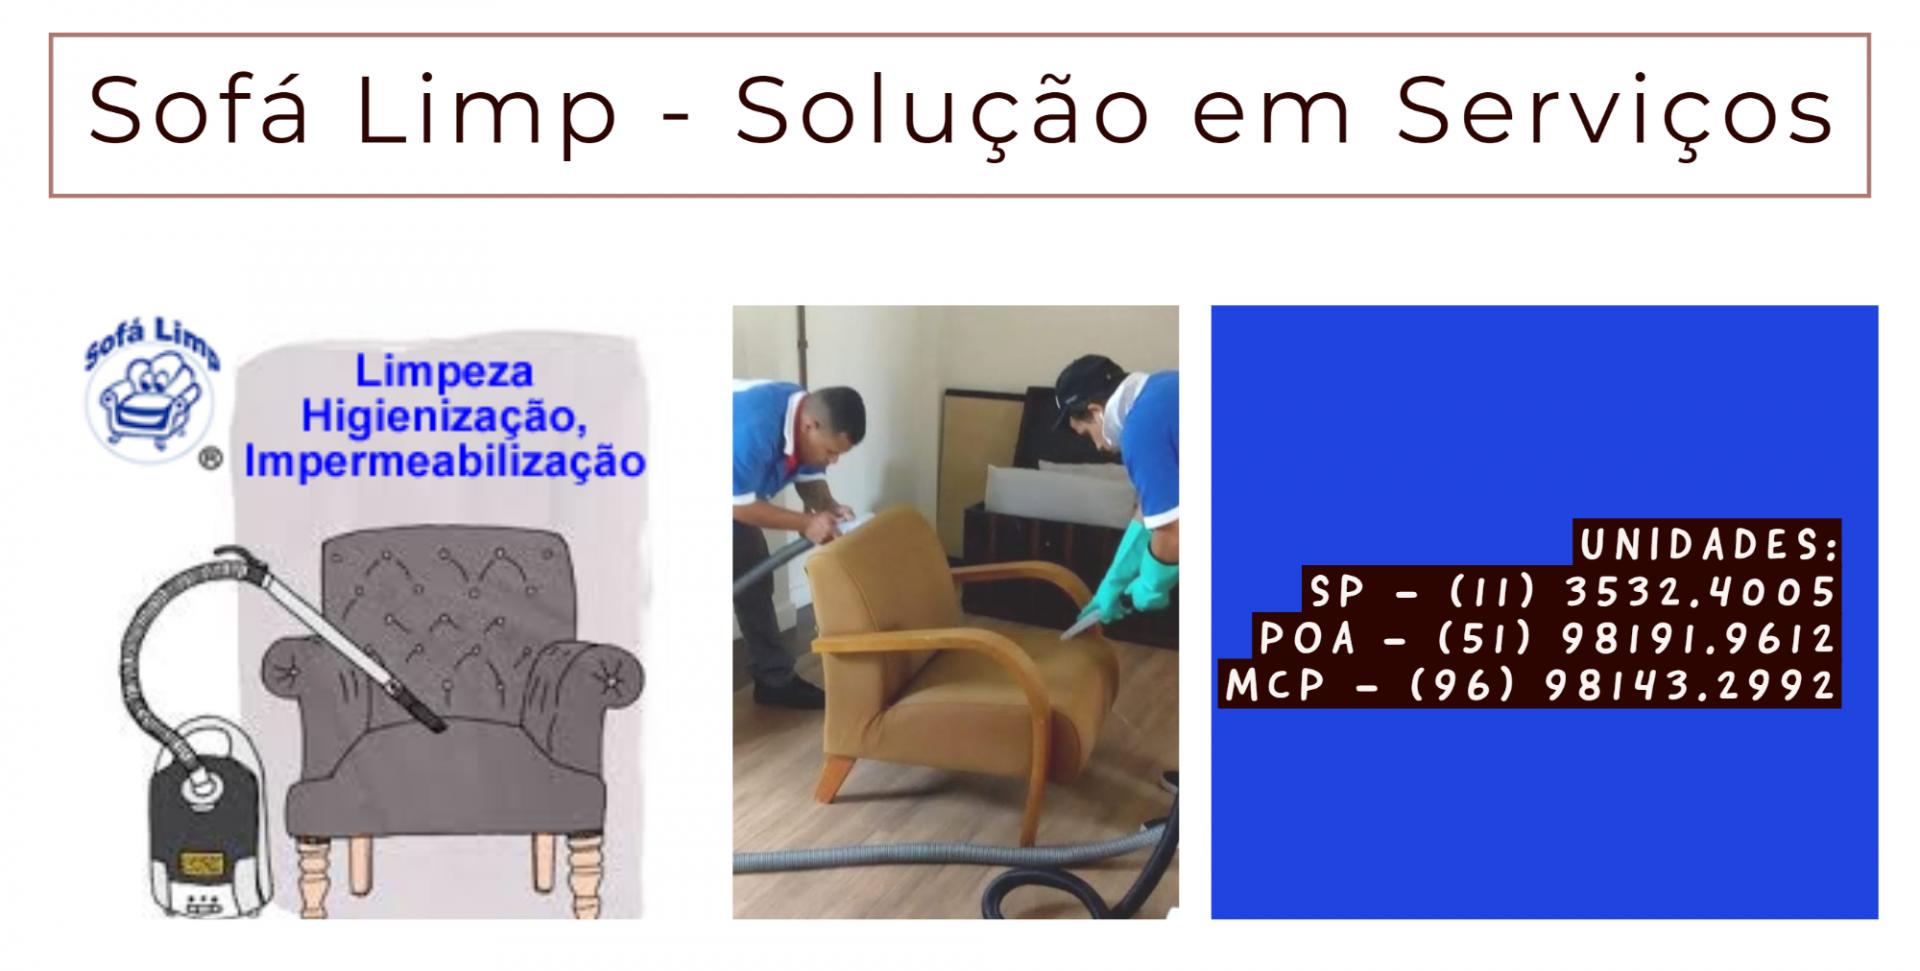 Sofá Limp